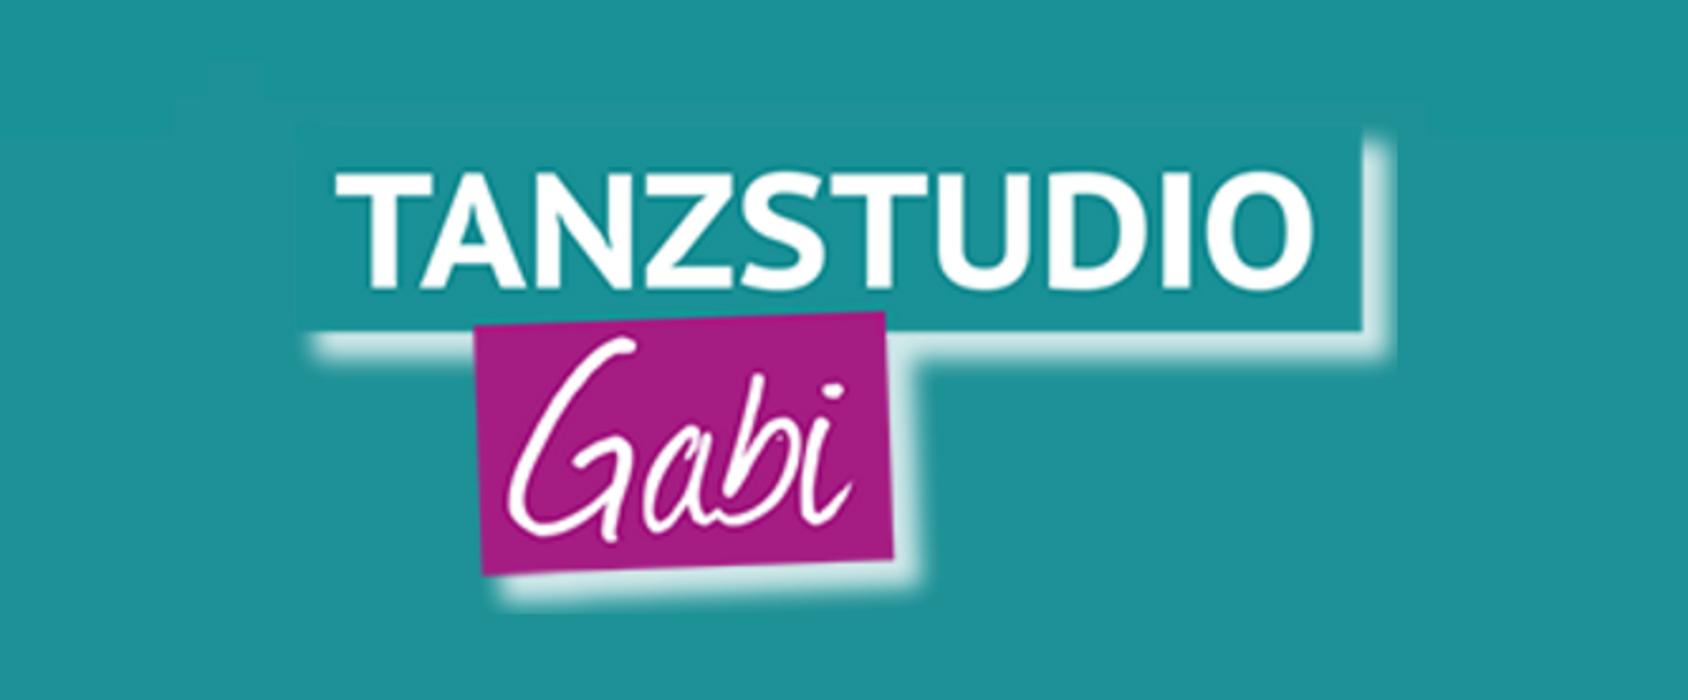 Tanzstudio Gabi in Saarlouis